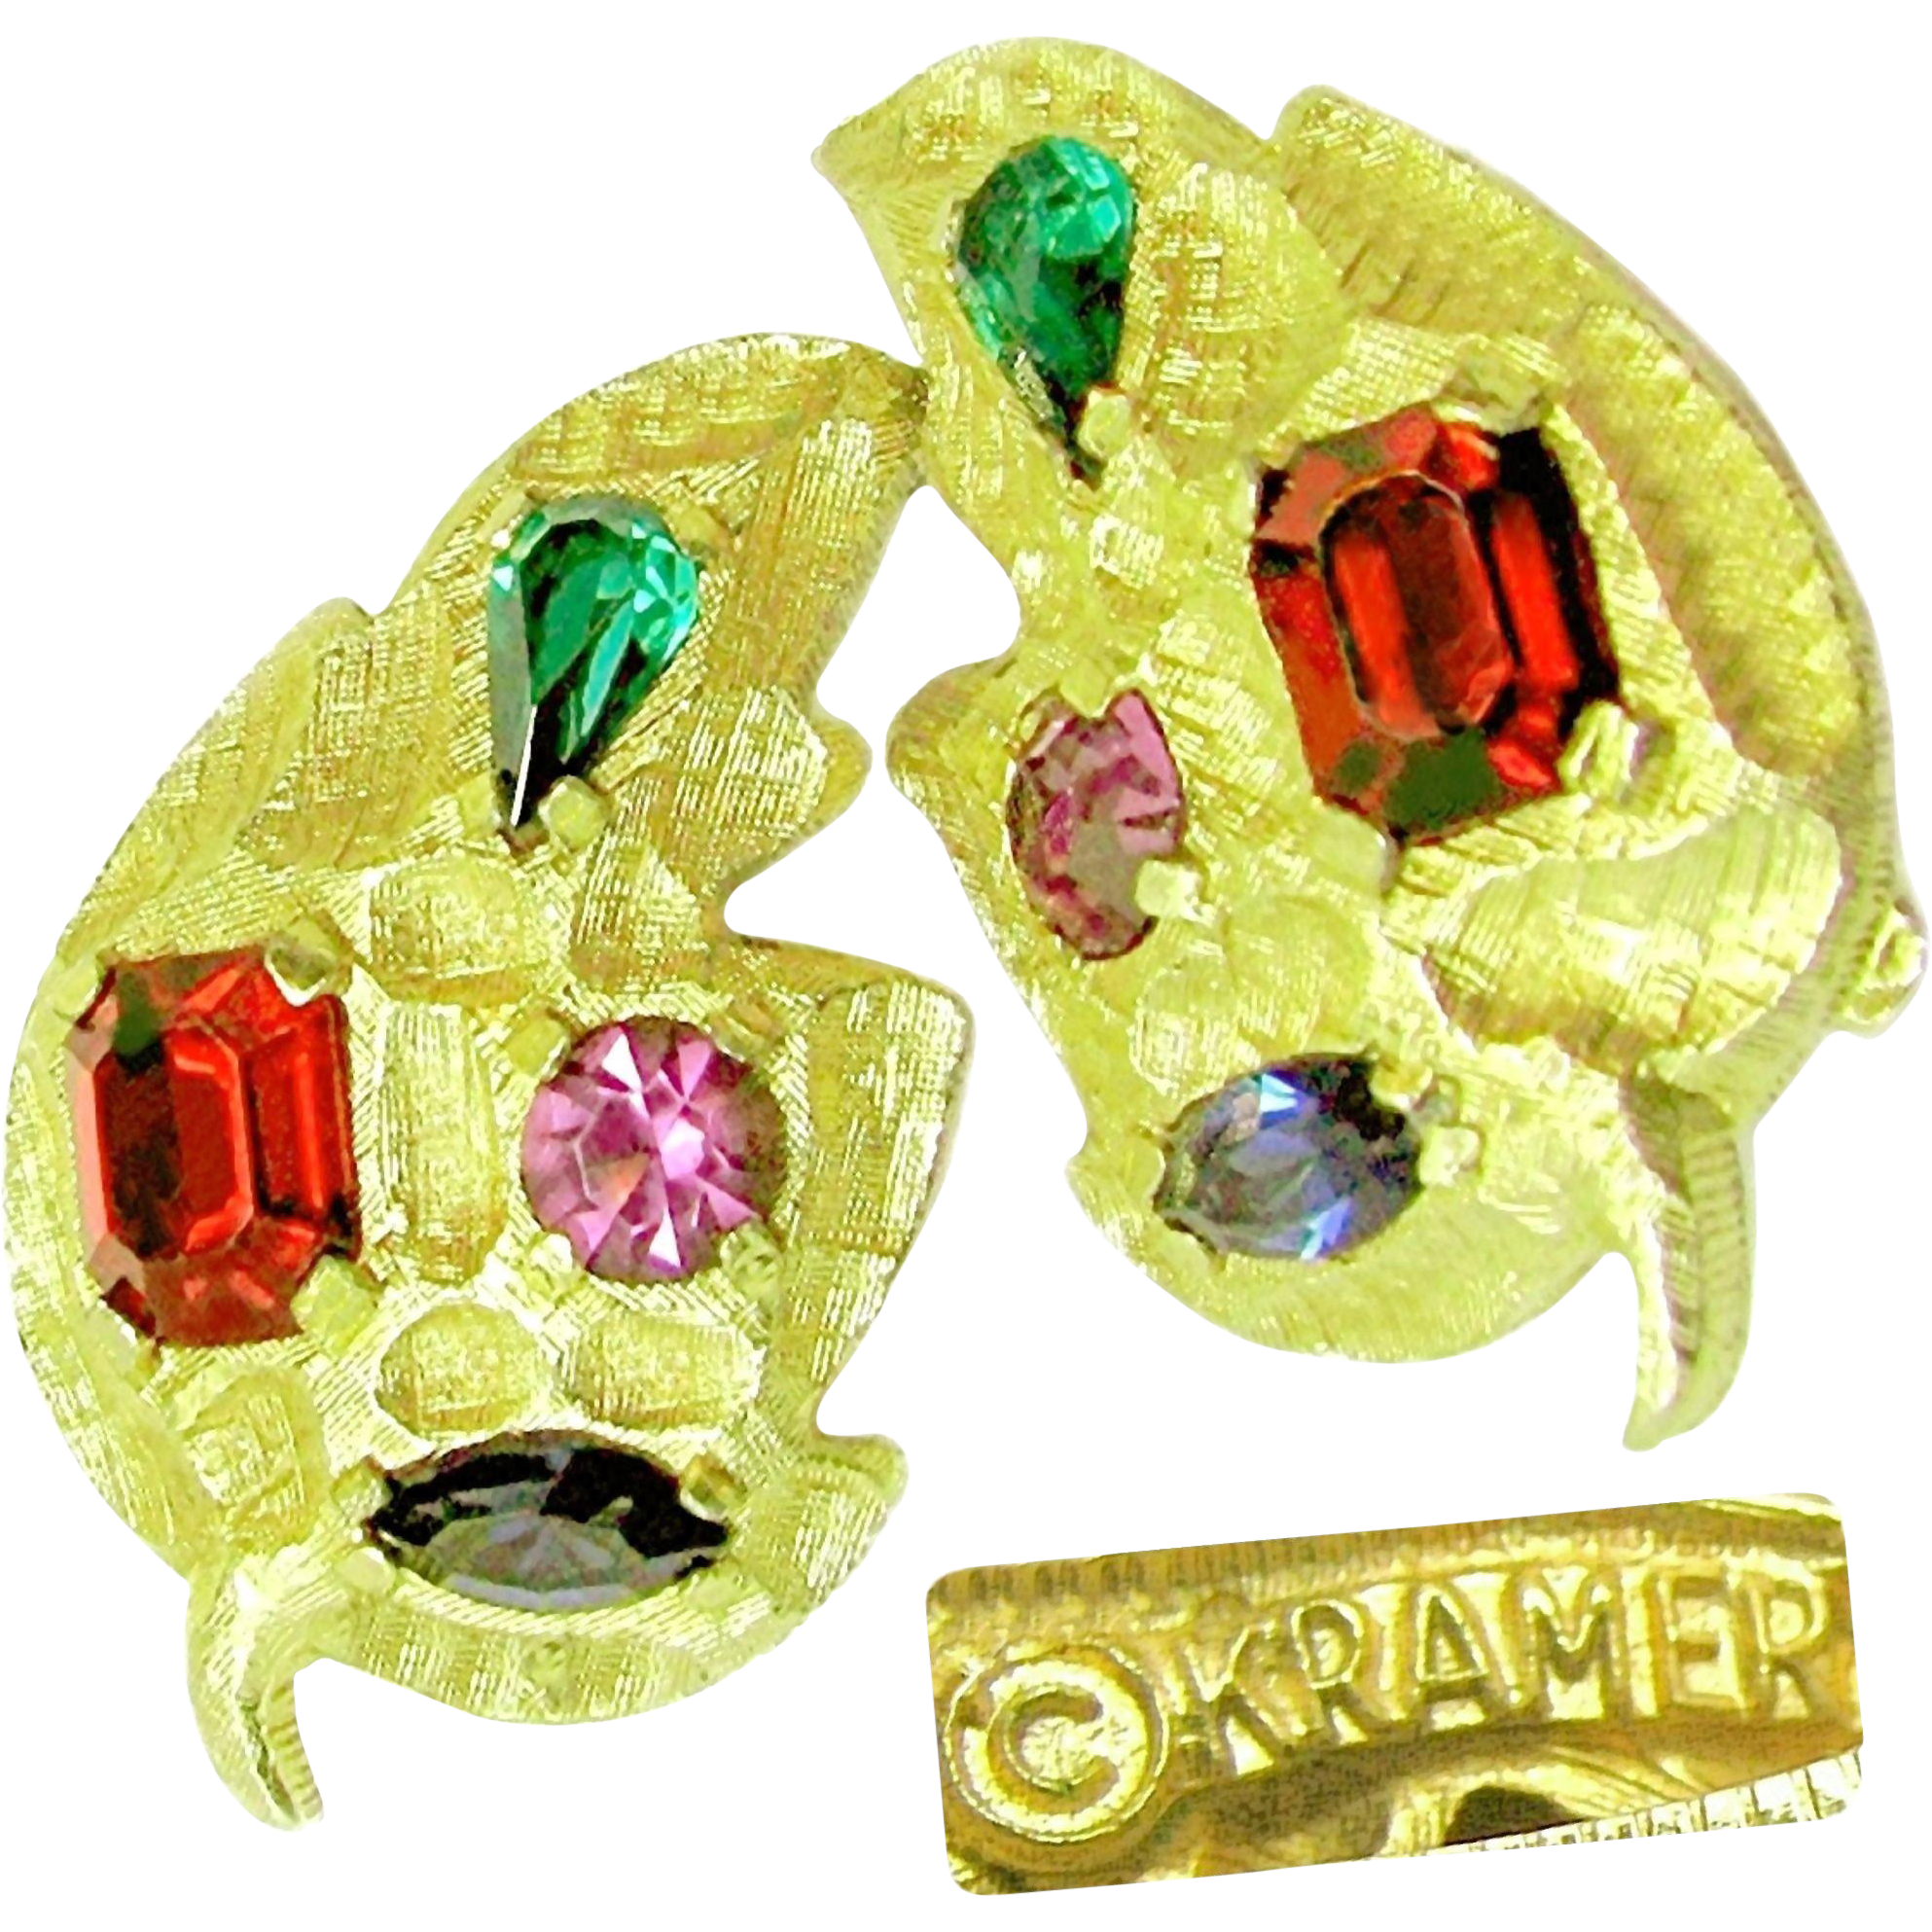 Dramatic KRAMER Statement Earrings w/ Glass Jewel-tone Realistic Prong Set Stones